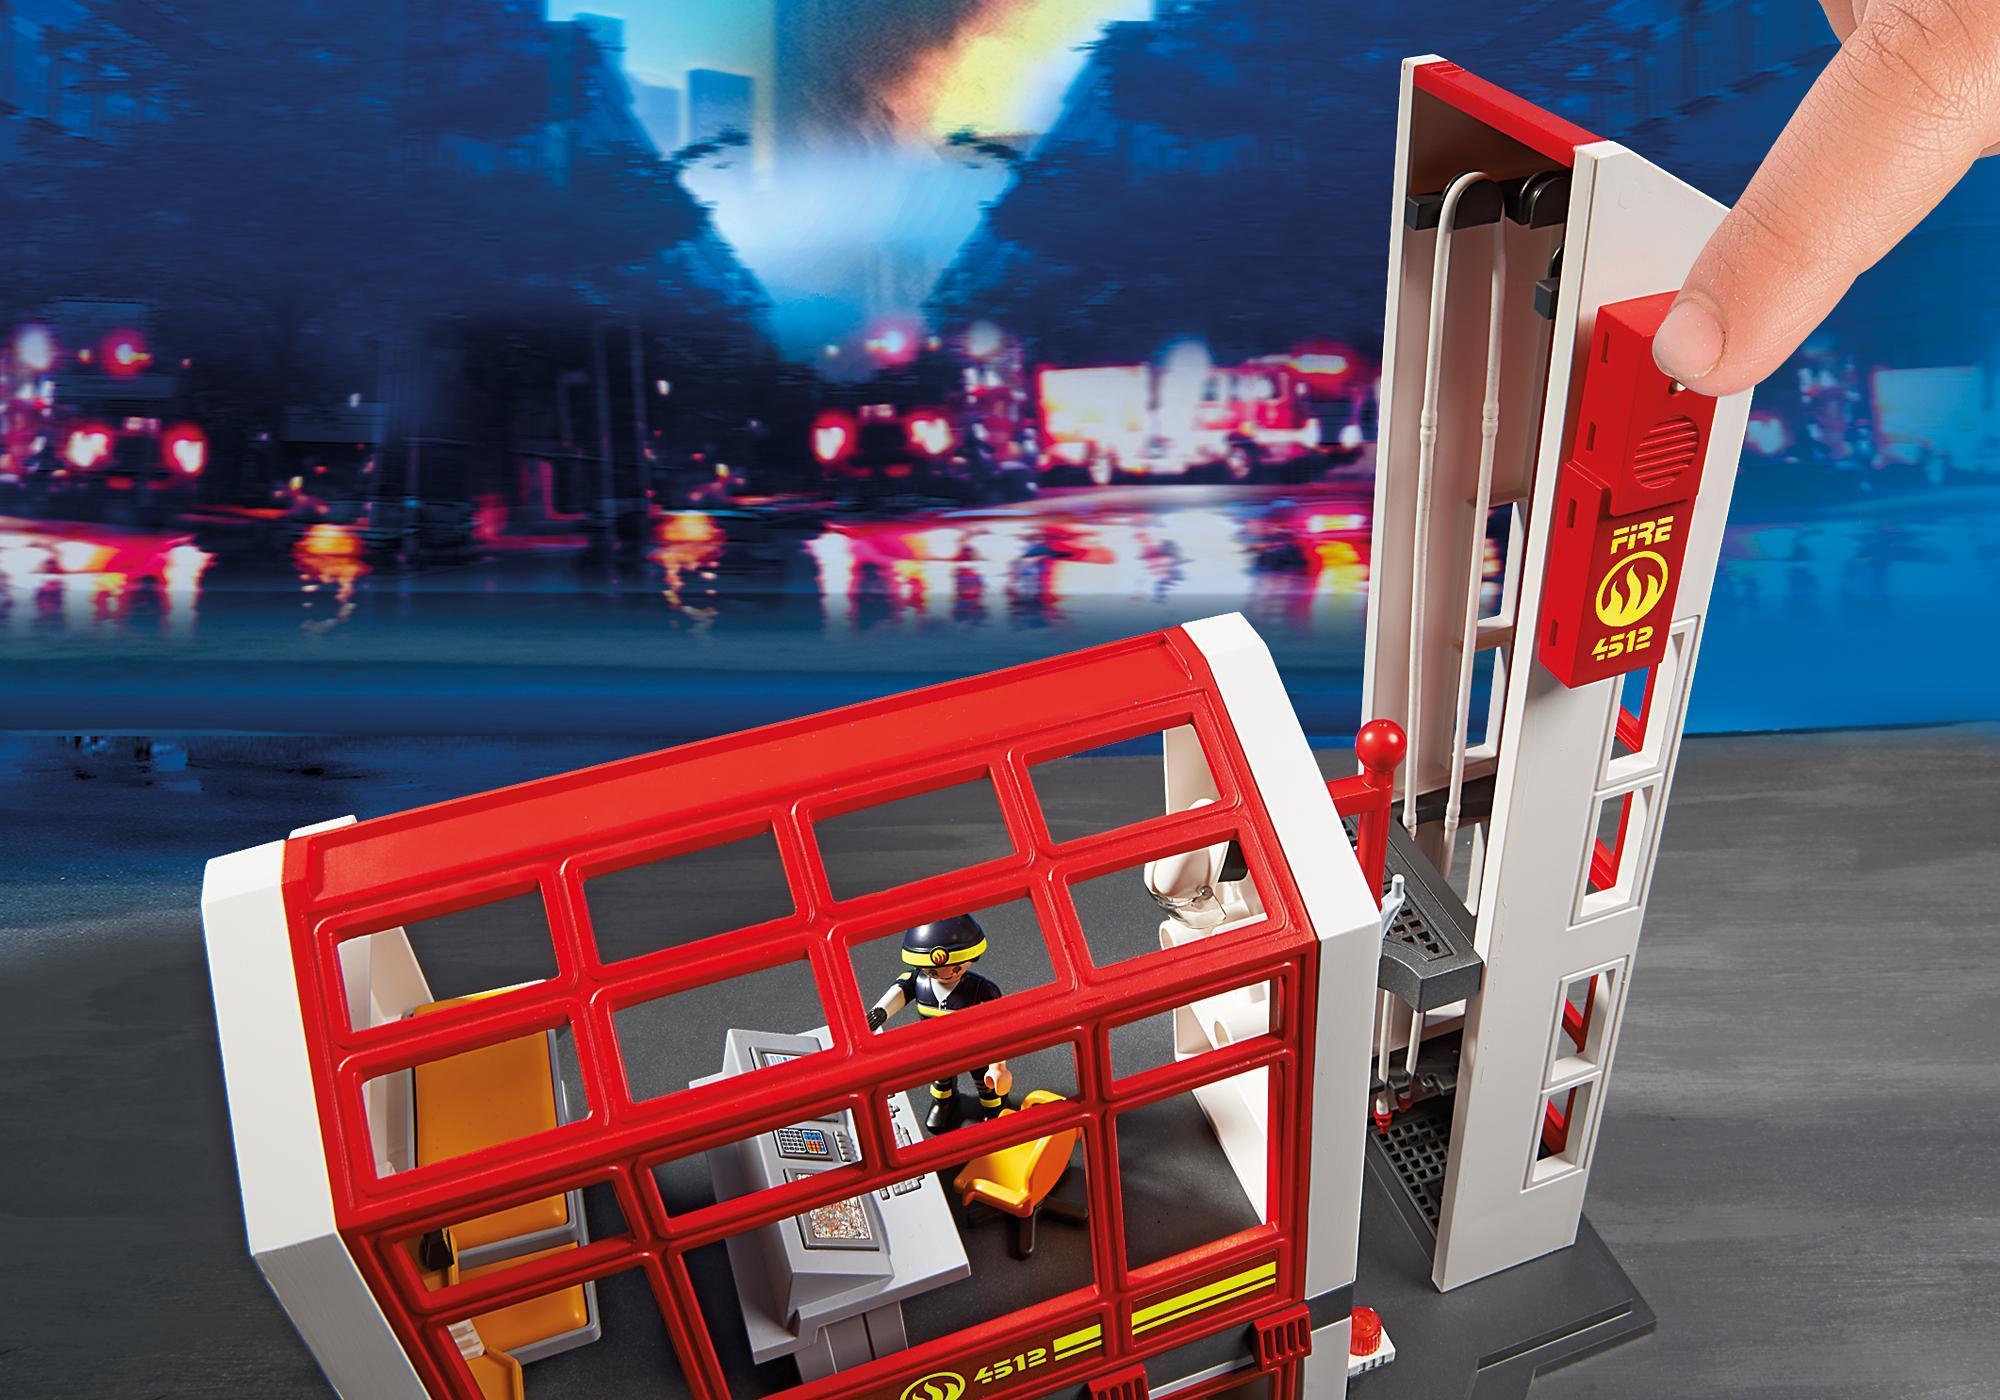 http://media.playmobil.com/i/playmobil/5361_product_extra1/Fire Station with Alarm